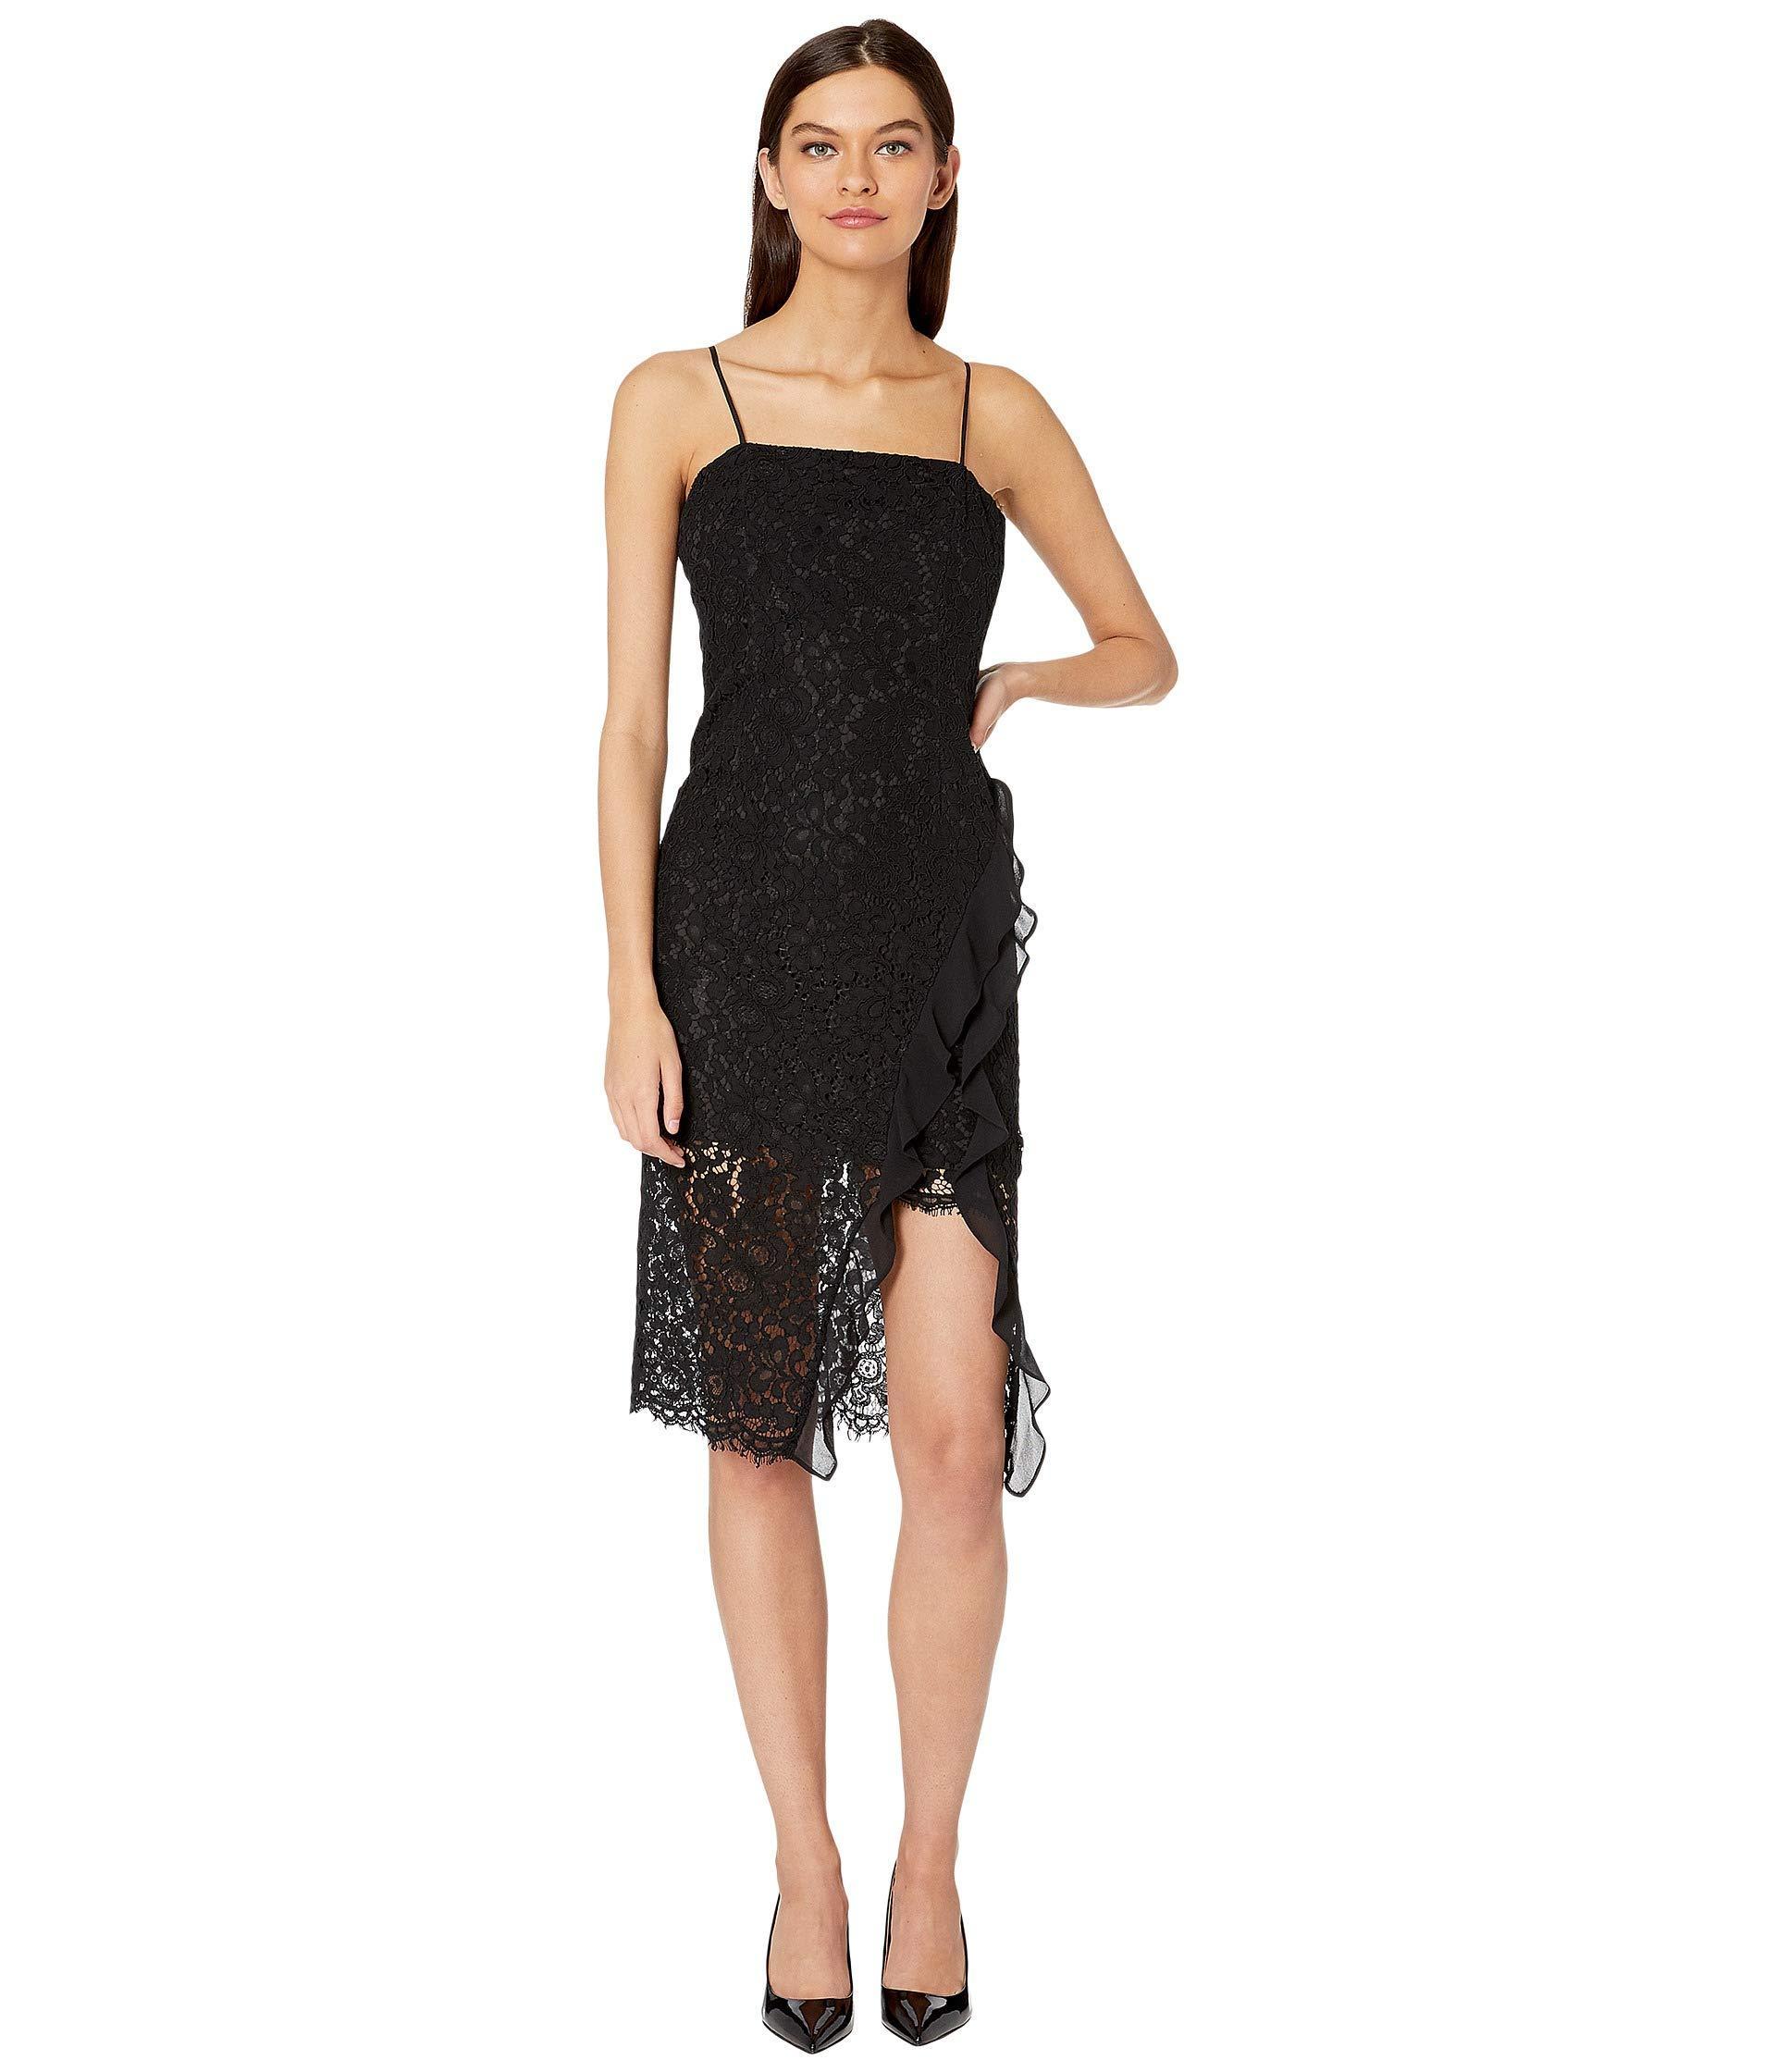 e22a2dcf325f Bardot - Priscilla Lace Dress (black) Women's Clothing - Lyst. View  fullscreen